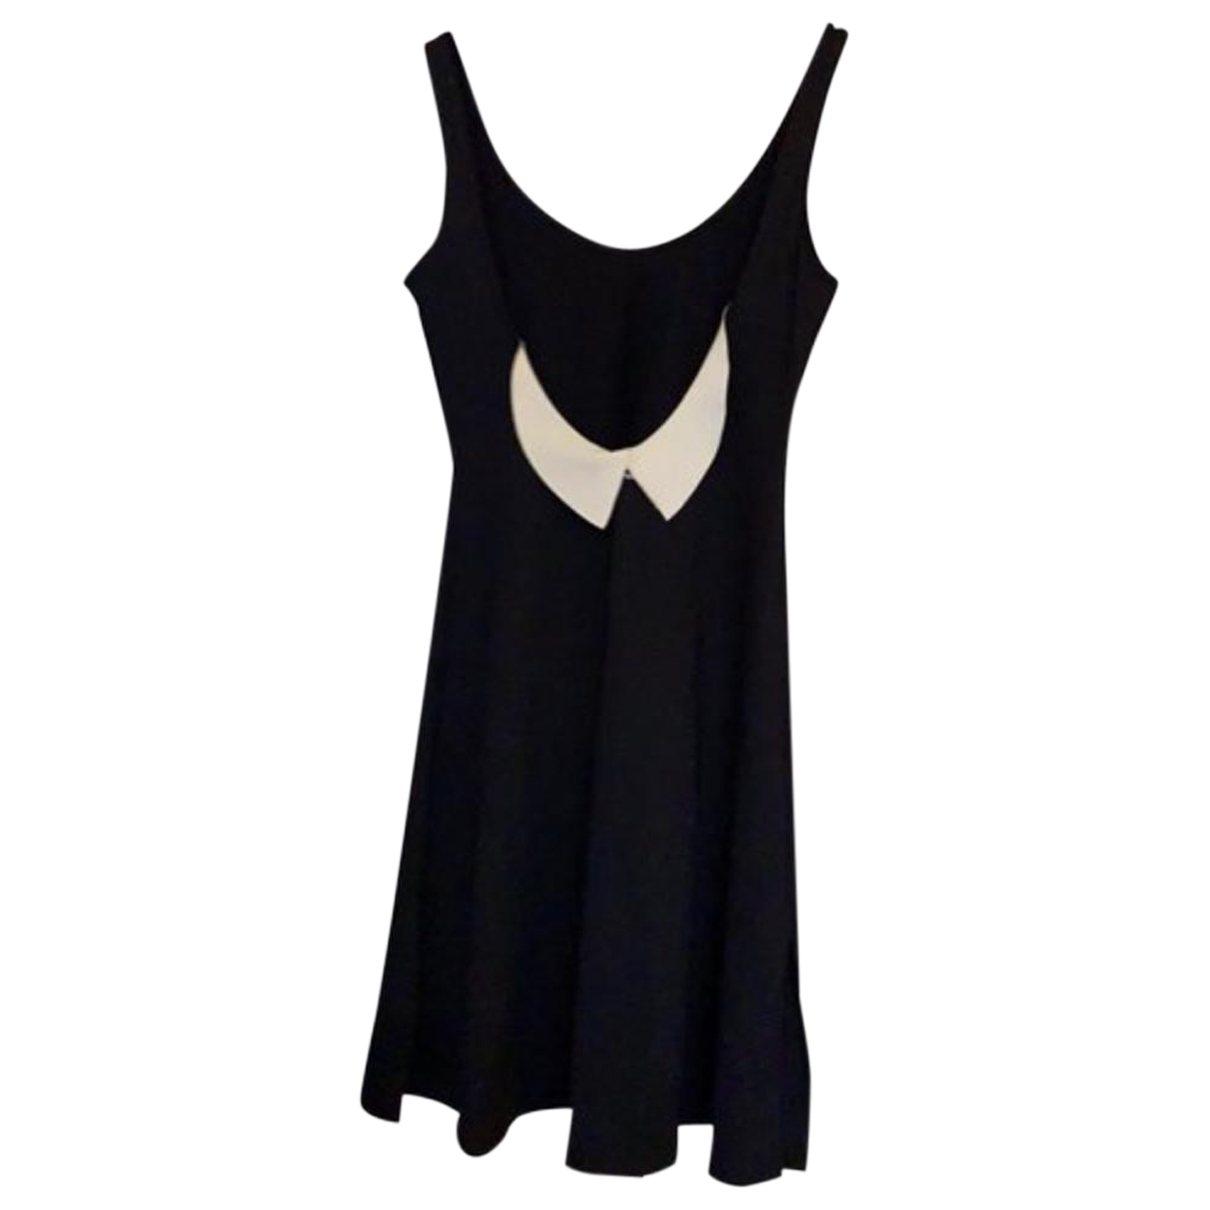 Chanel \N Anthracite dress for Women 12 UK